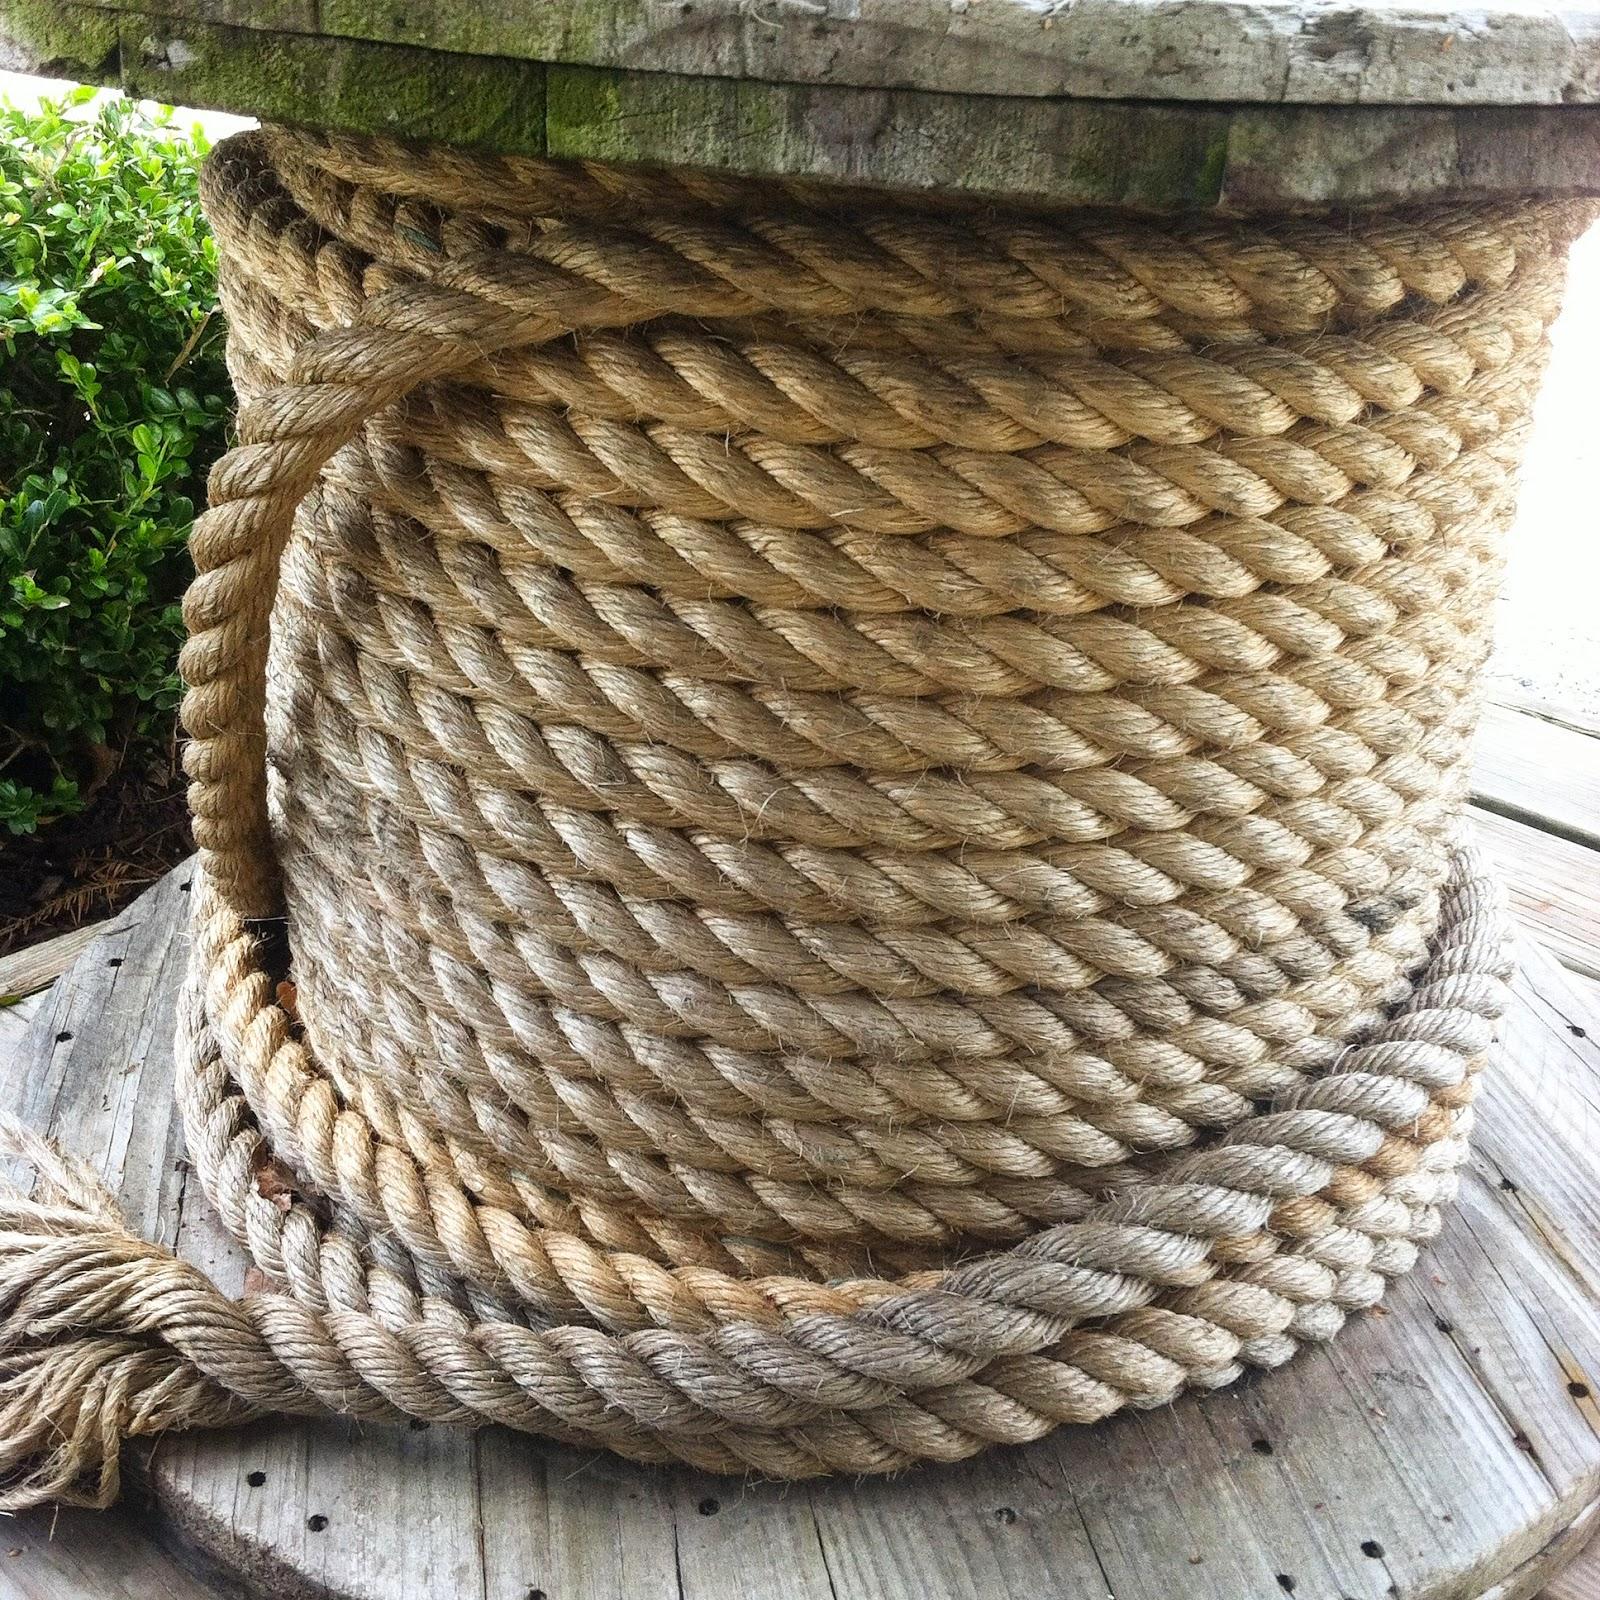 Beach house living rustic salty nautical decor ideas - Nautical rope decorating ideas ...